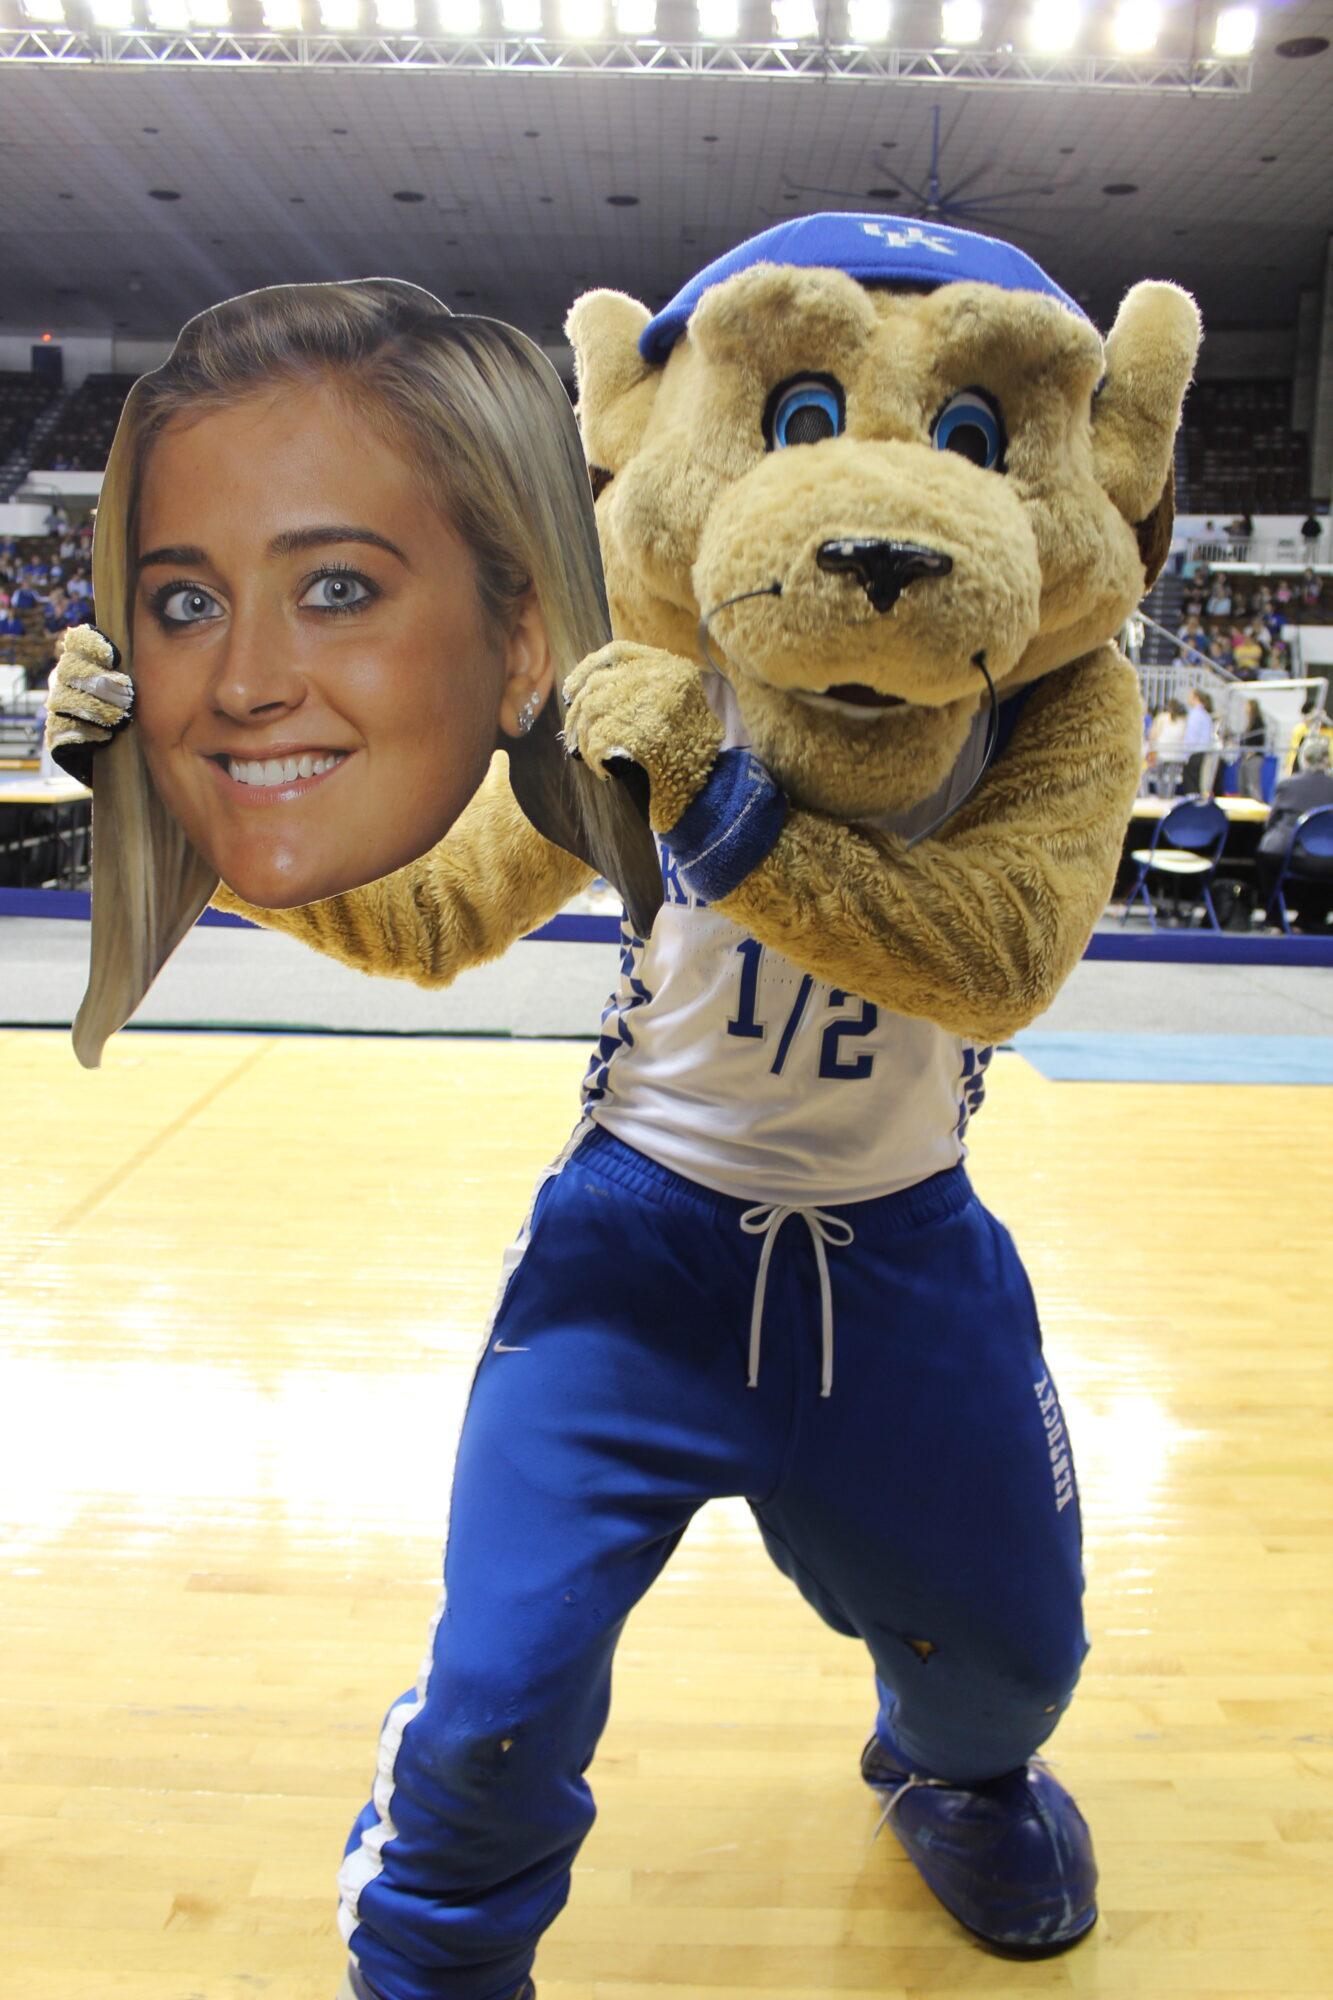 Kentucky vs. Missouri - Scratch the Wildcat with Alex Hyland Fathead